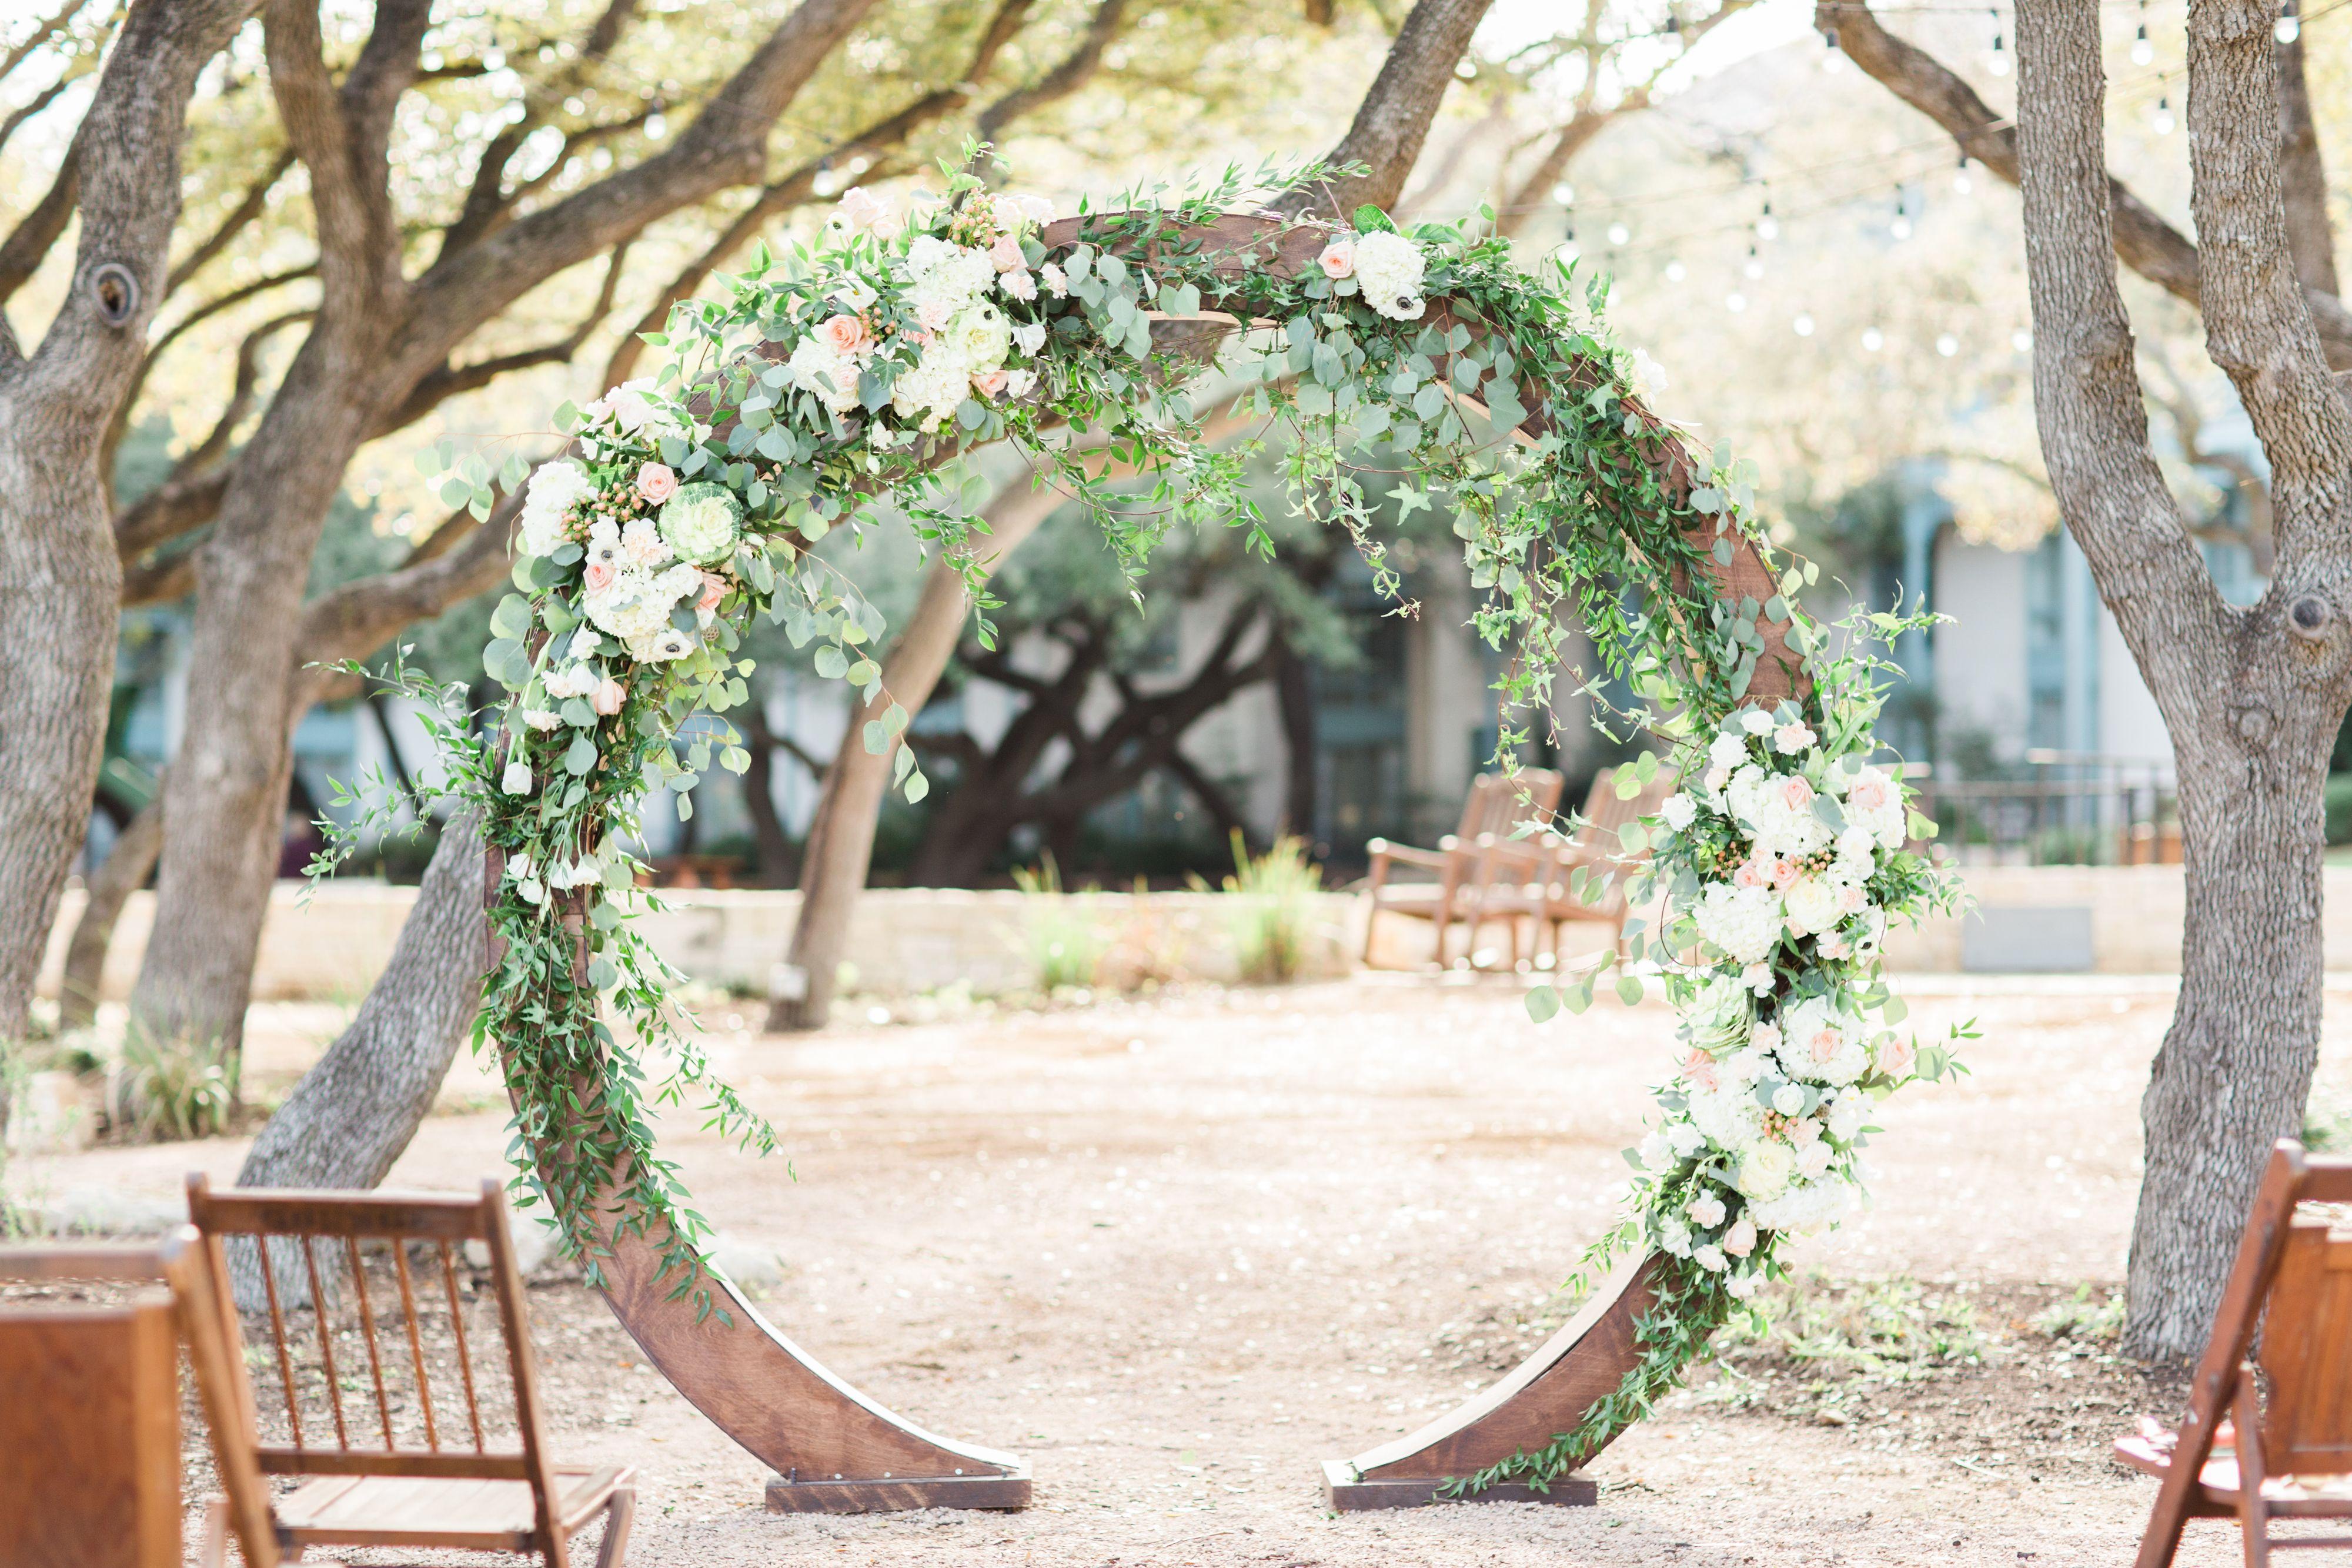 Elegant Outdoor Wedding Ceremony Site Near San Antonio: This Rustic Yet Elegant Outdoor Wedding Venue Is